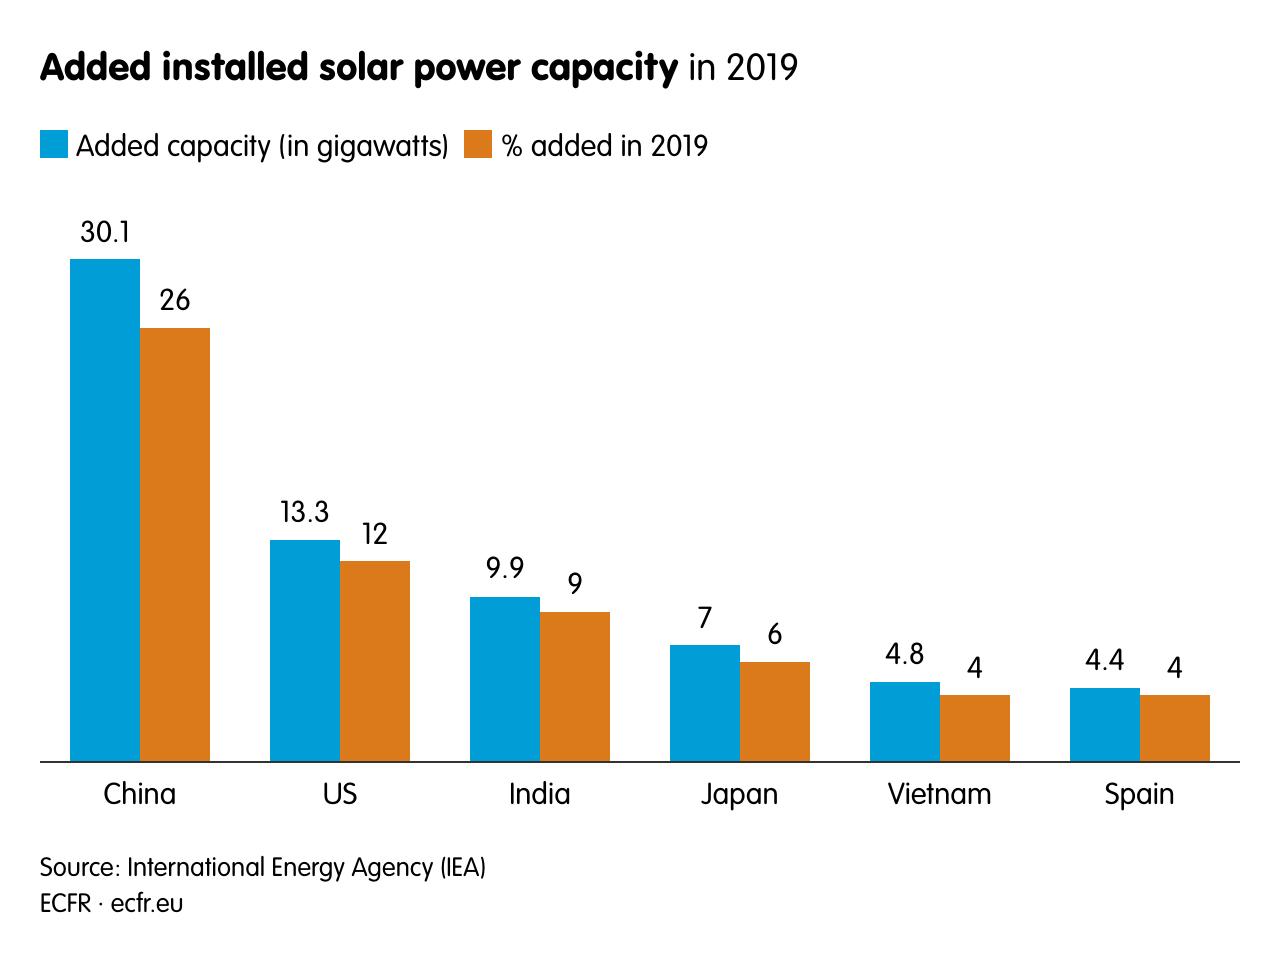 Added installed solar power capacity